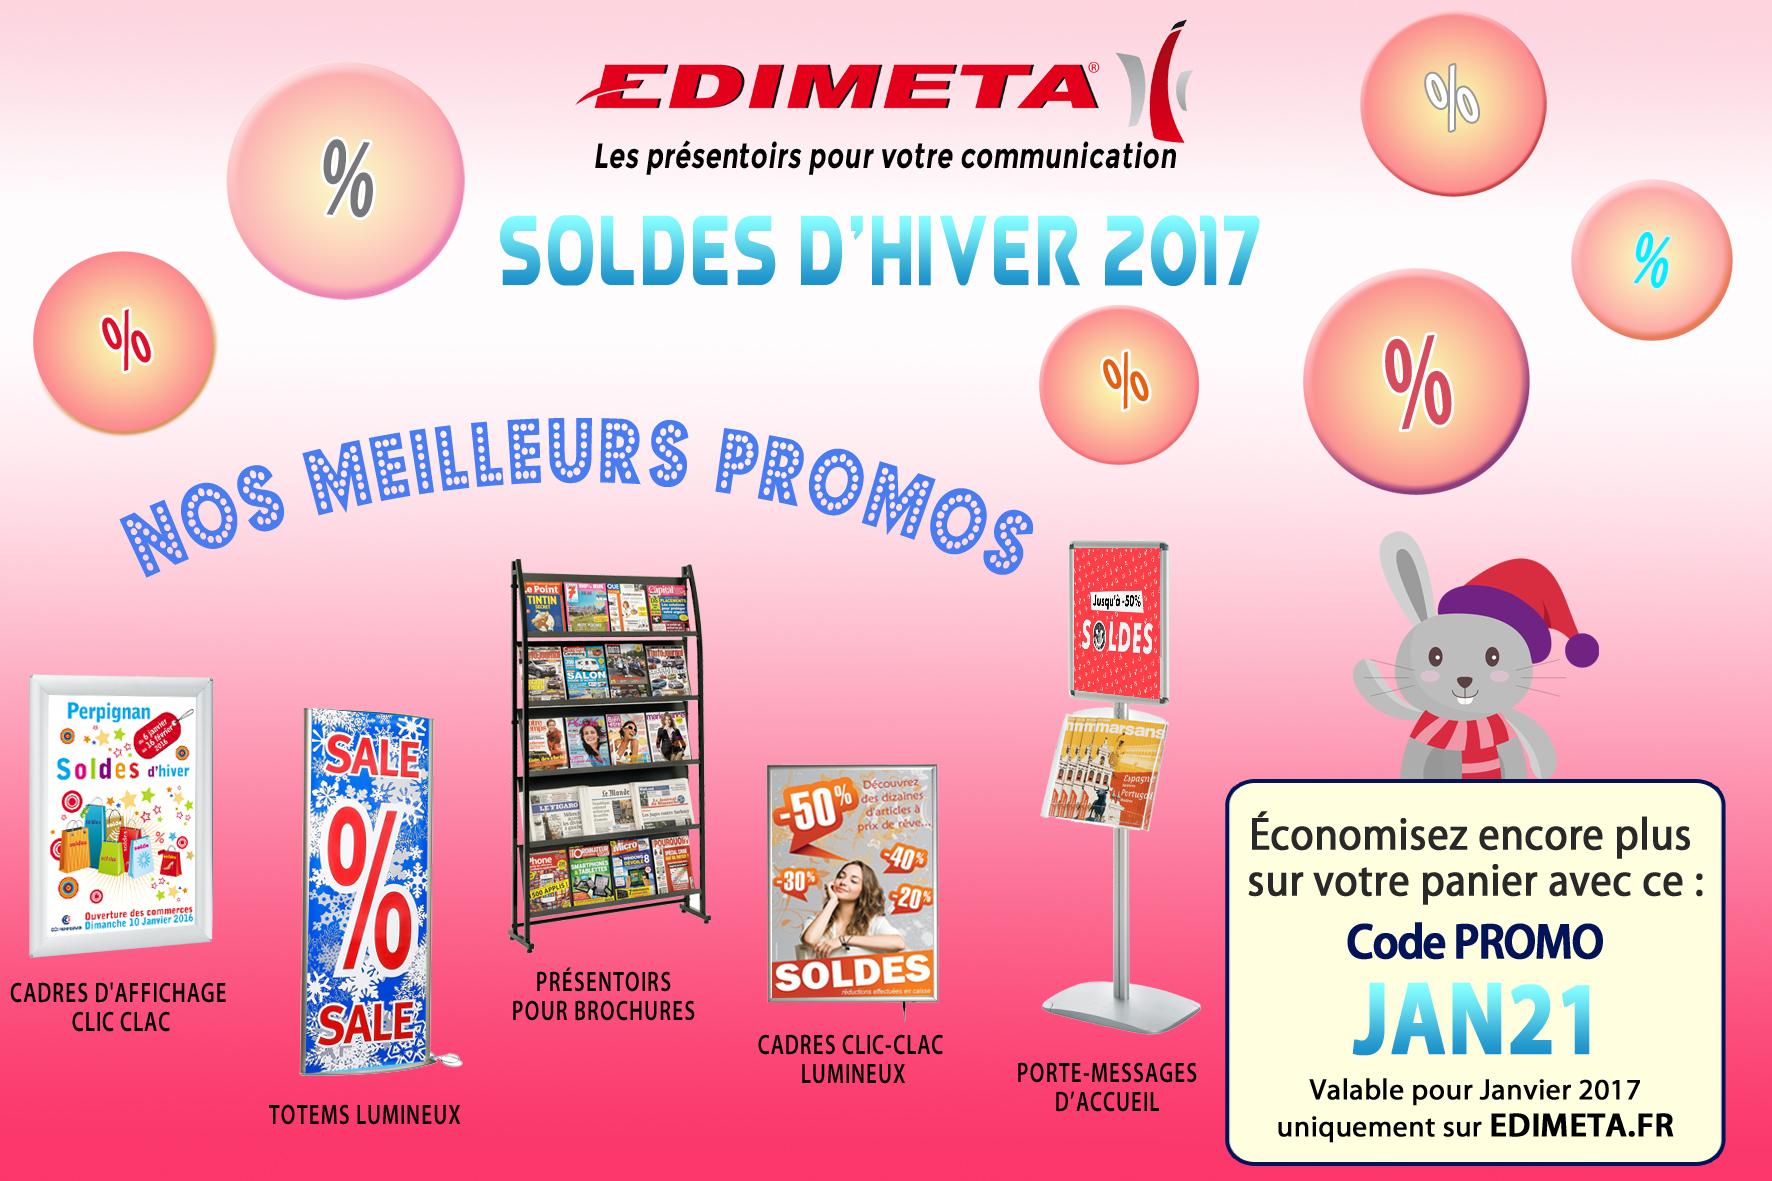 EDIMETA - Code promo pour Janvier 2017